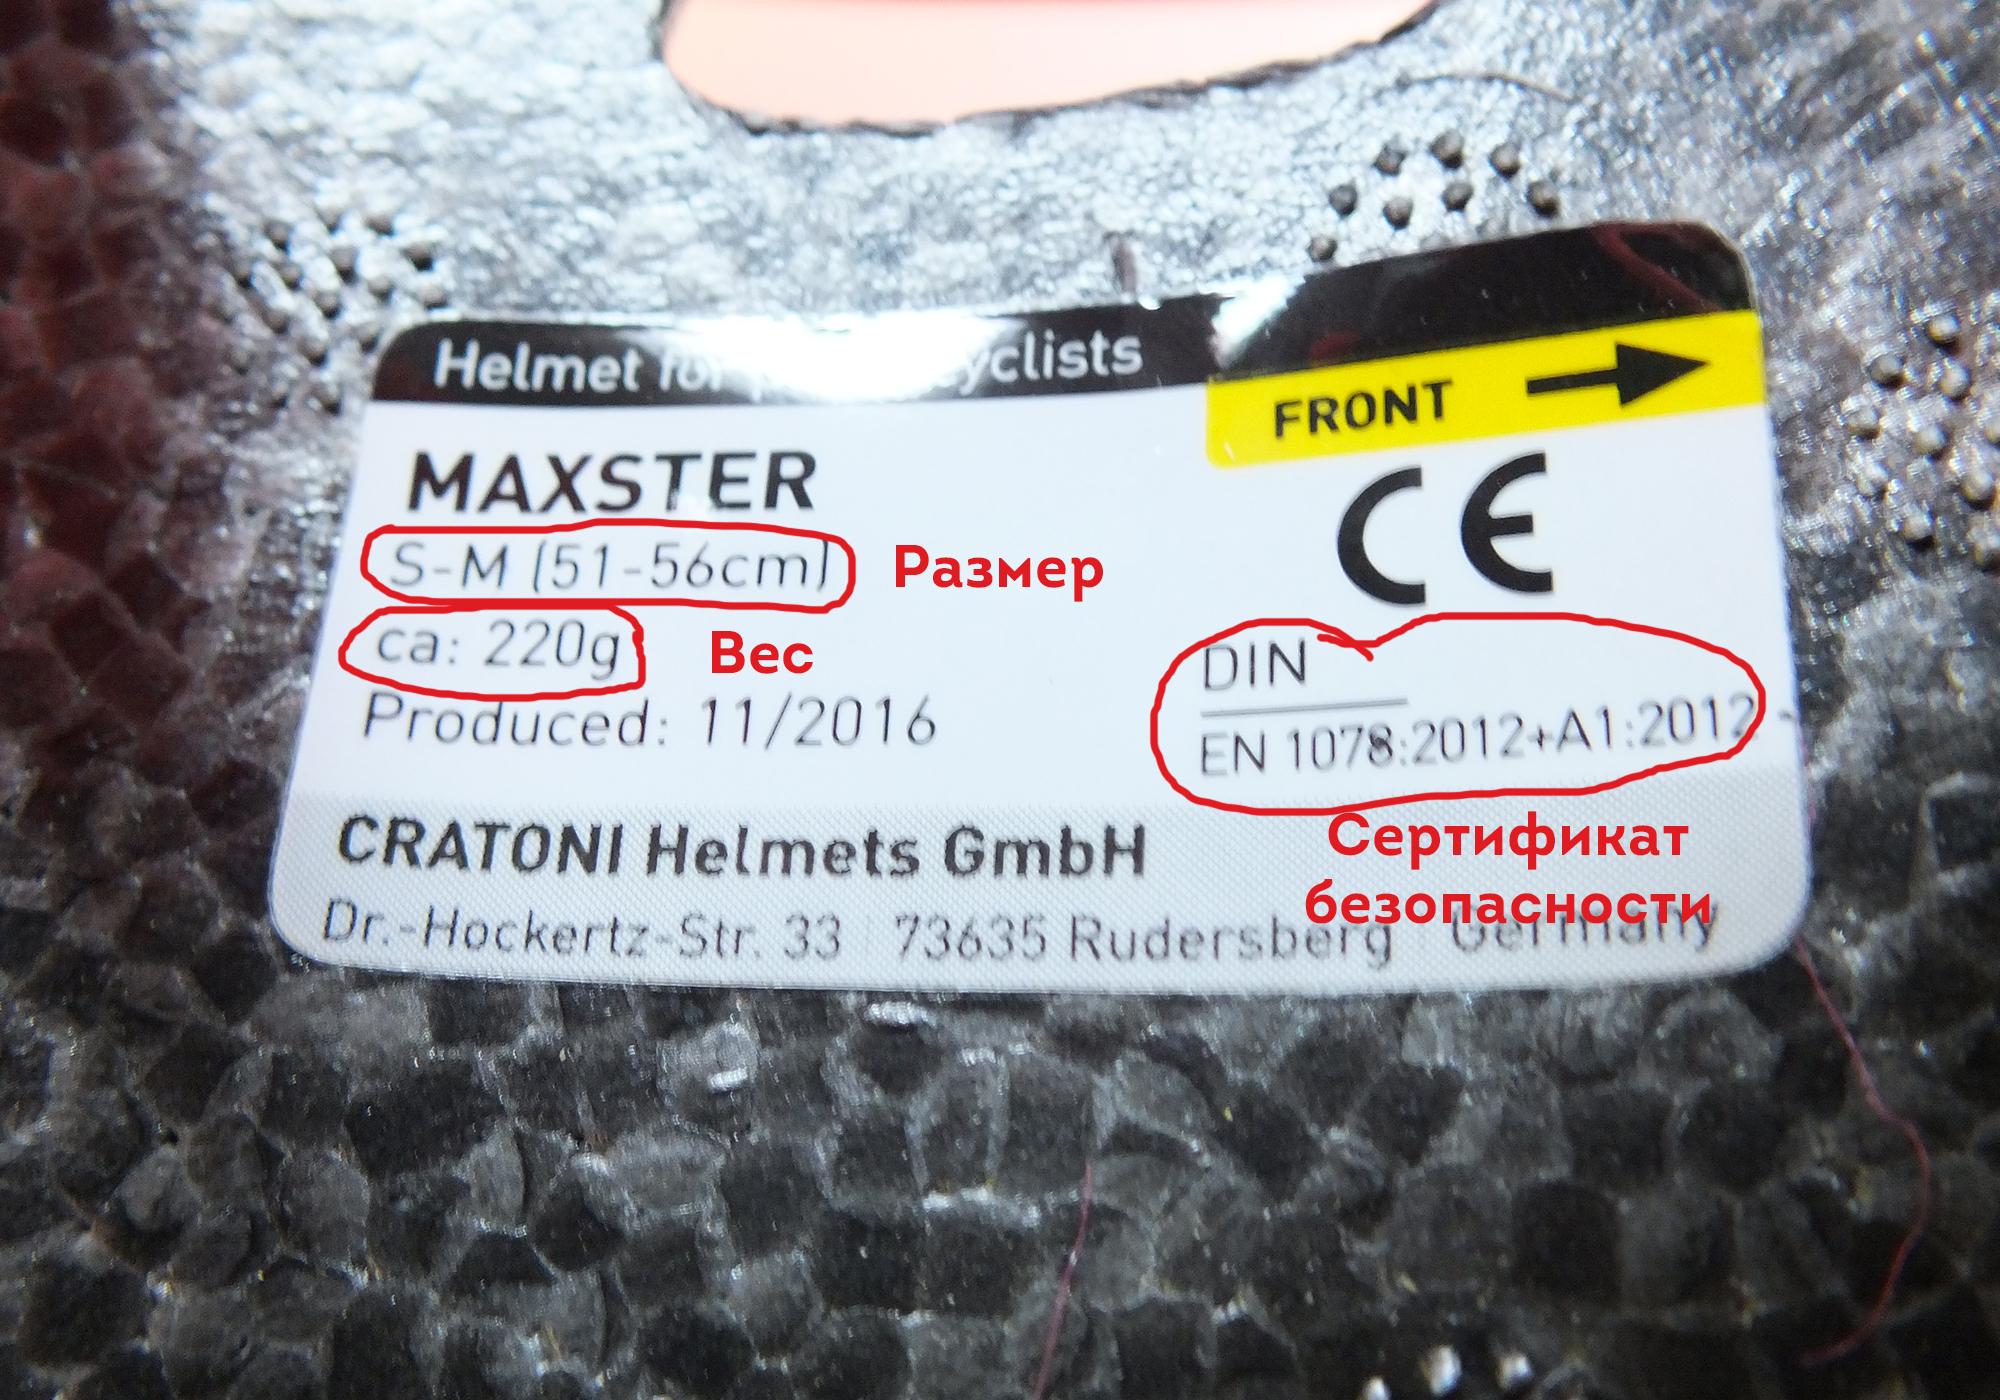 сертификат безопасности на шлемах